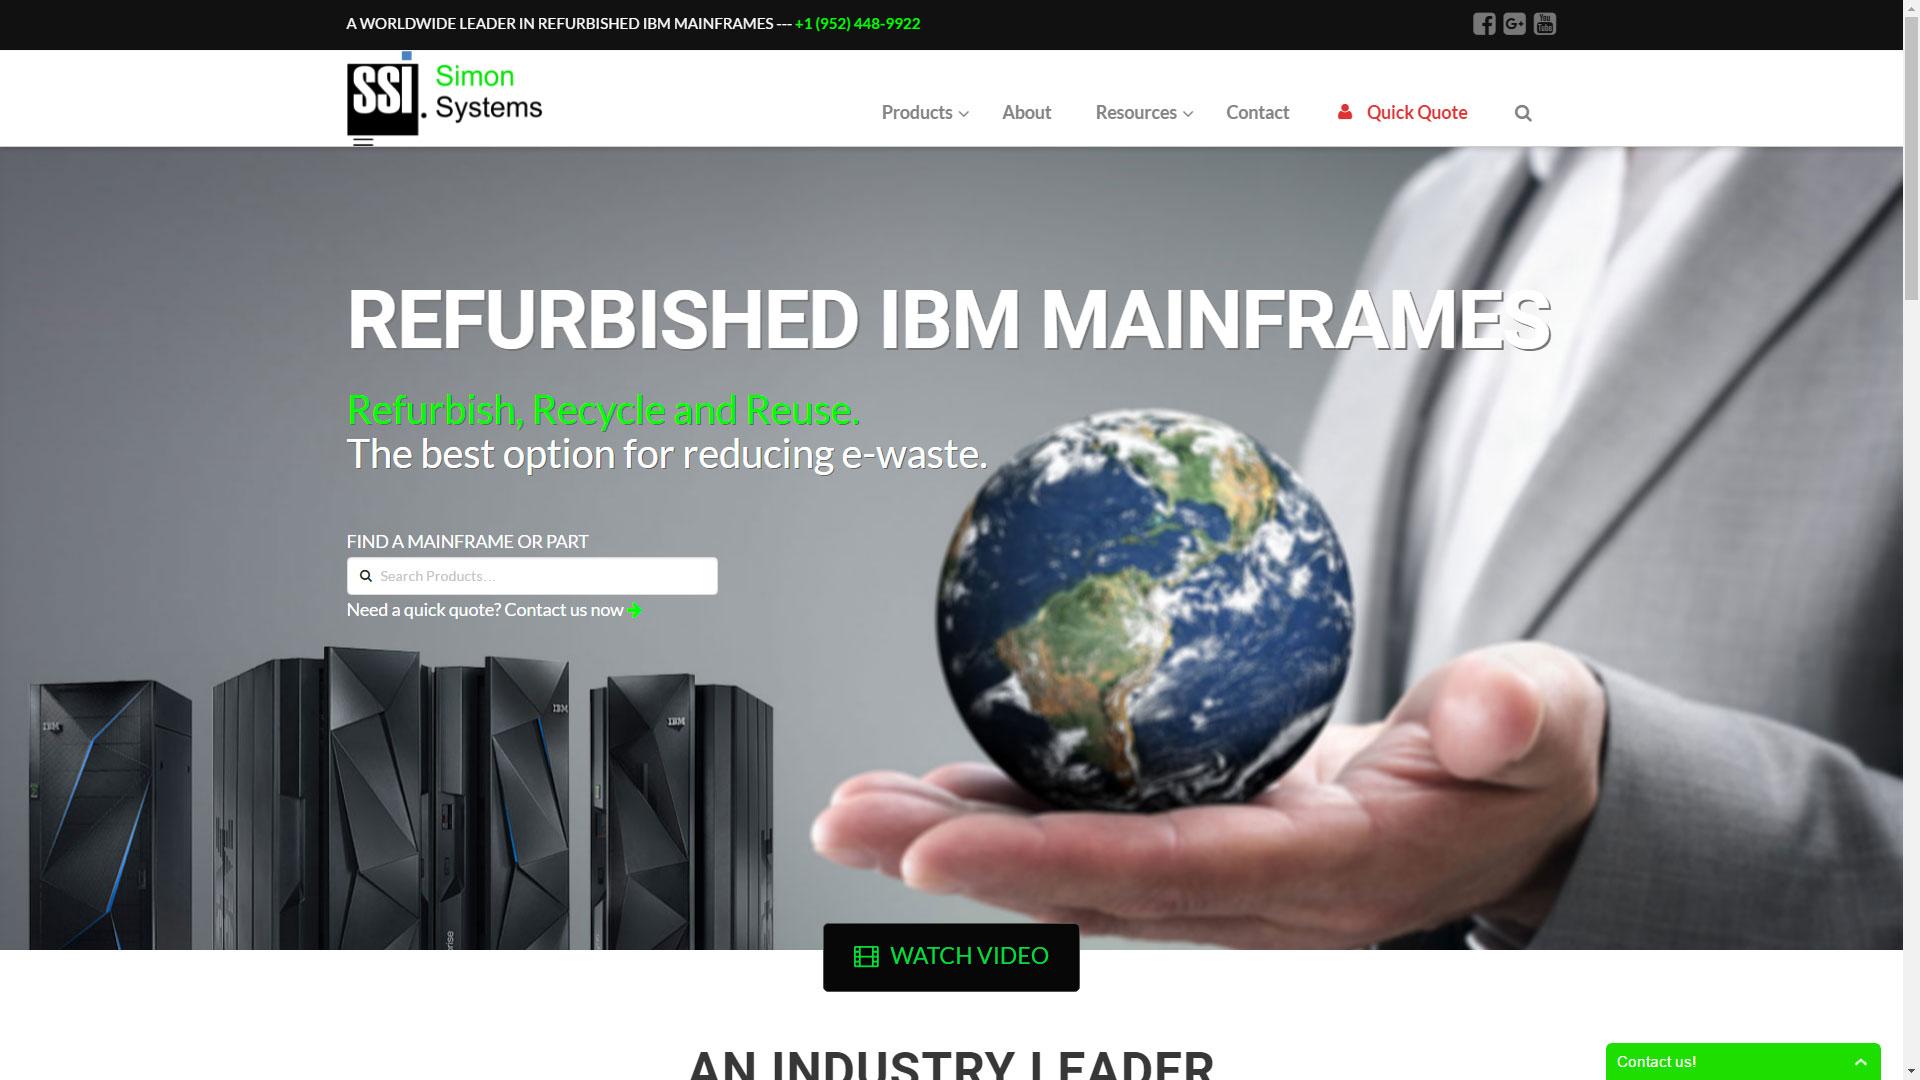 Simon Systems website development by Virbion